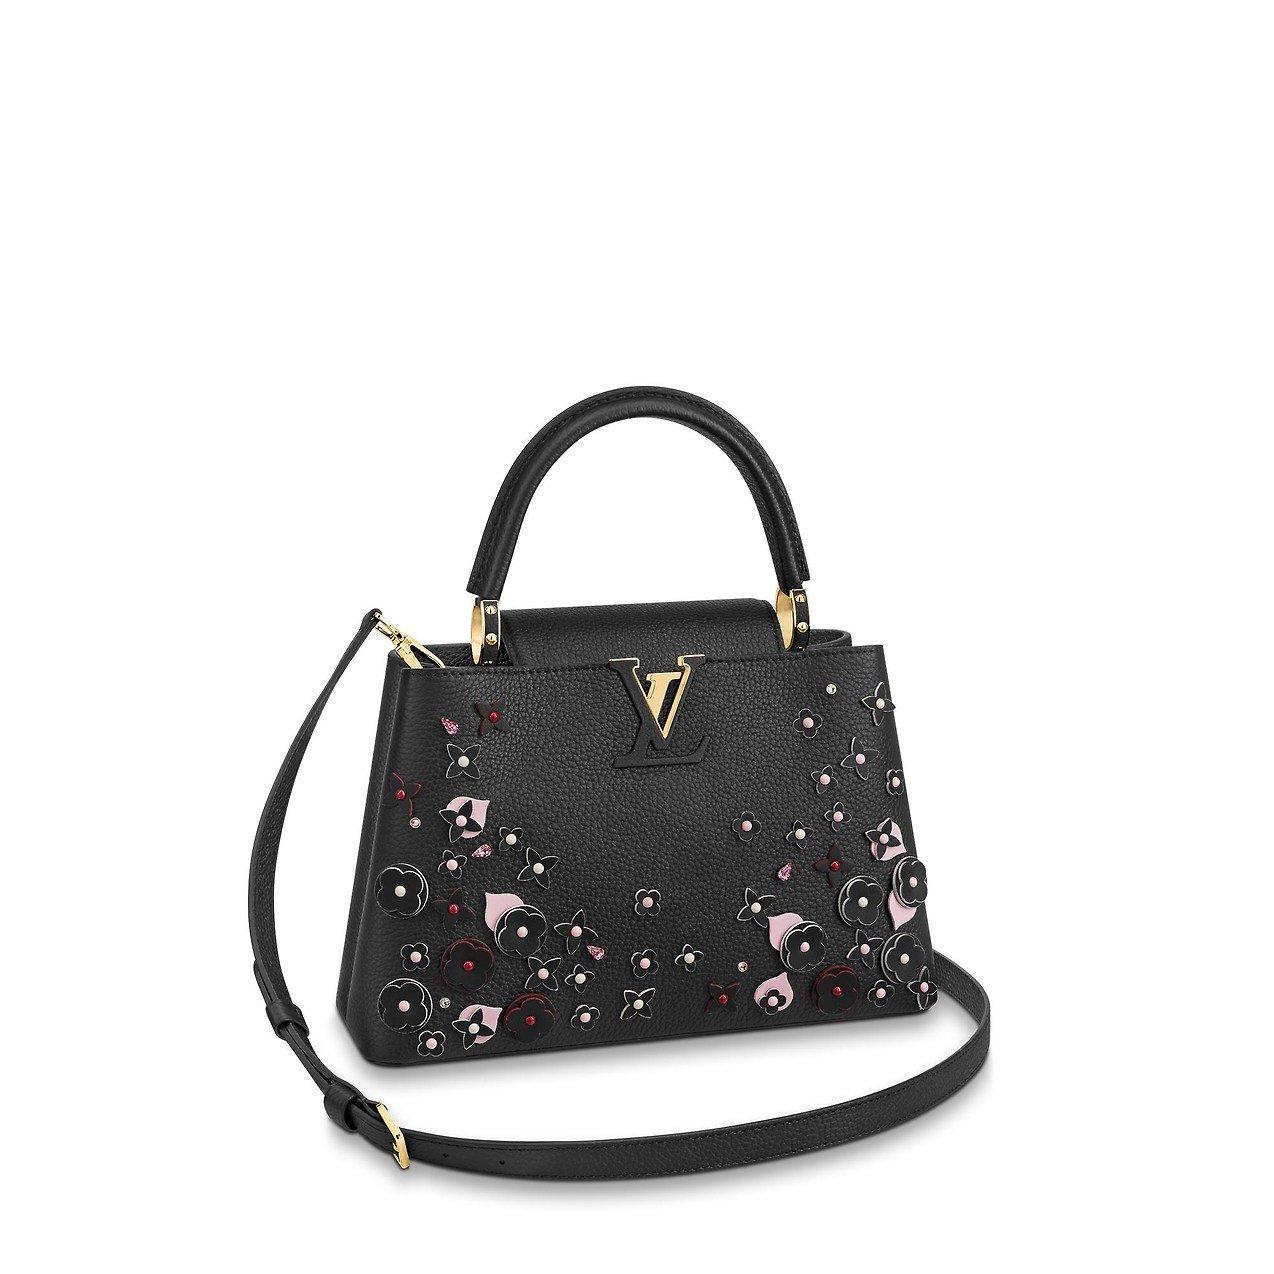 Borsa Capucines Louis Vuitton 2019 prezzo 3900 euro